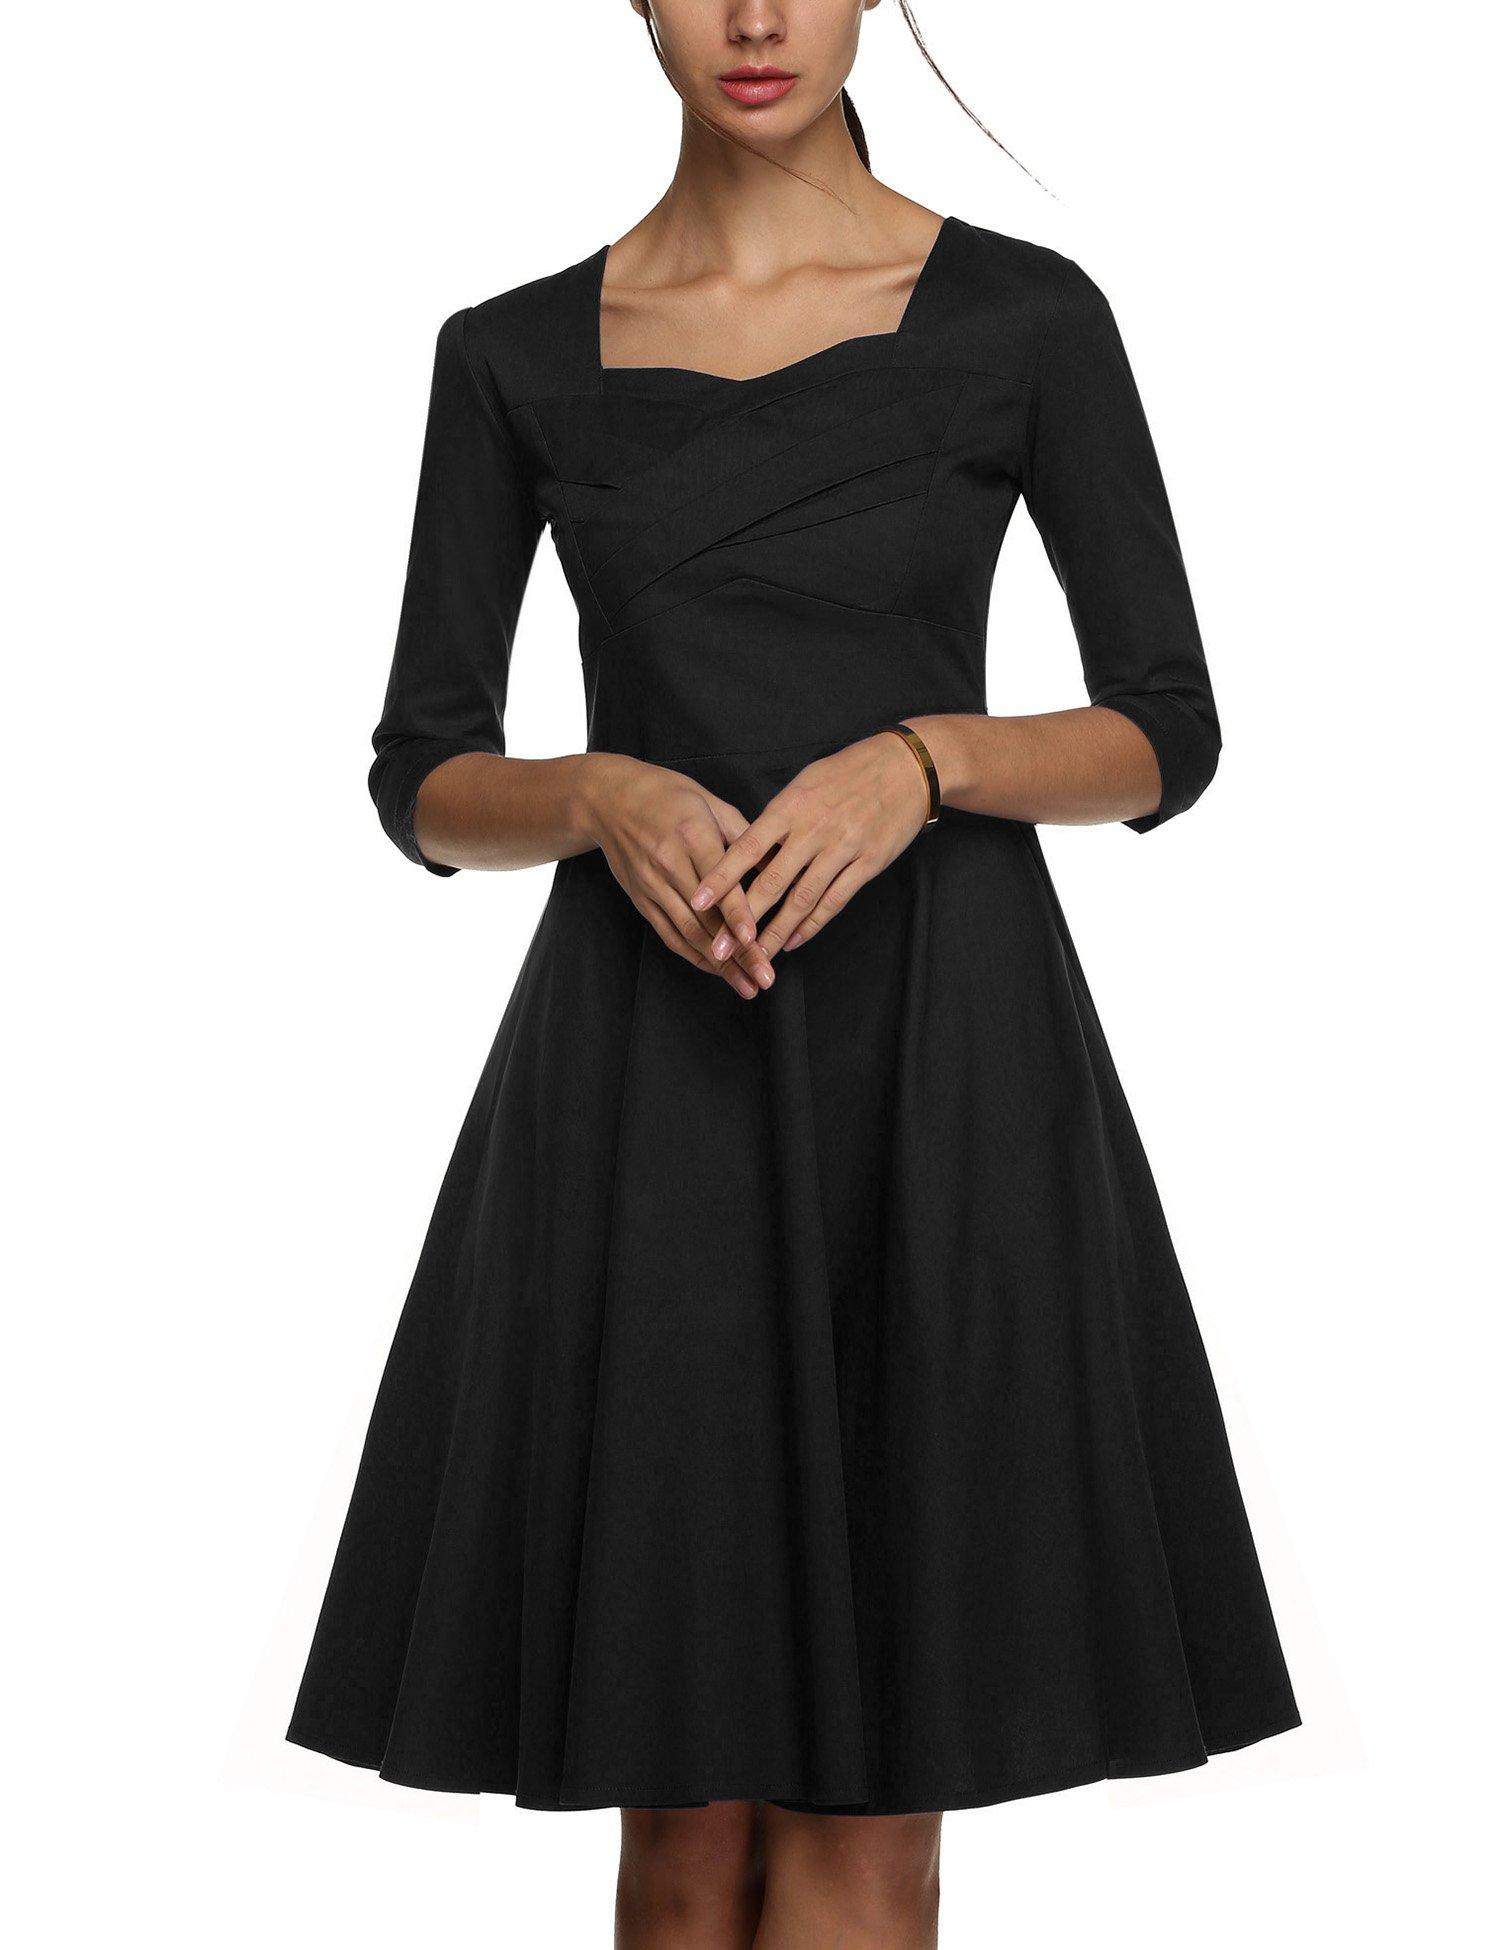 UpBeauty Women Scoop Neck 3 4 Sleeve Bodycon Evening Cocktail Party Dress,Black,Medium